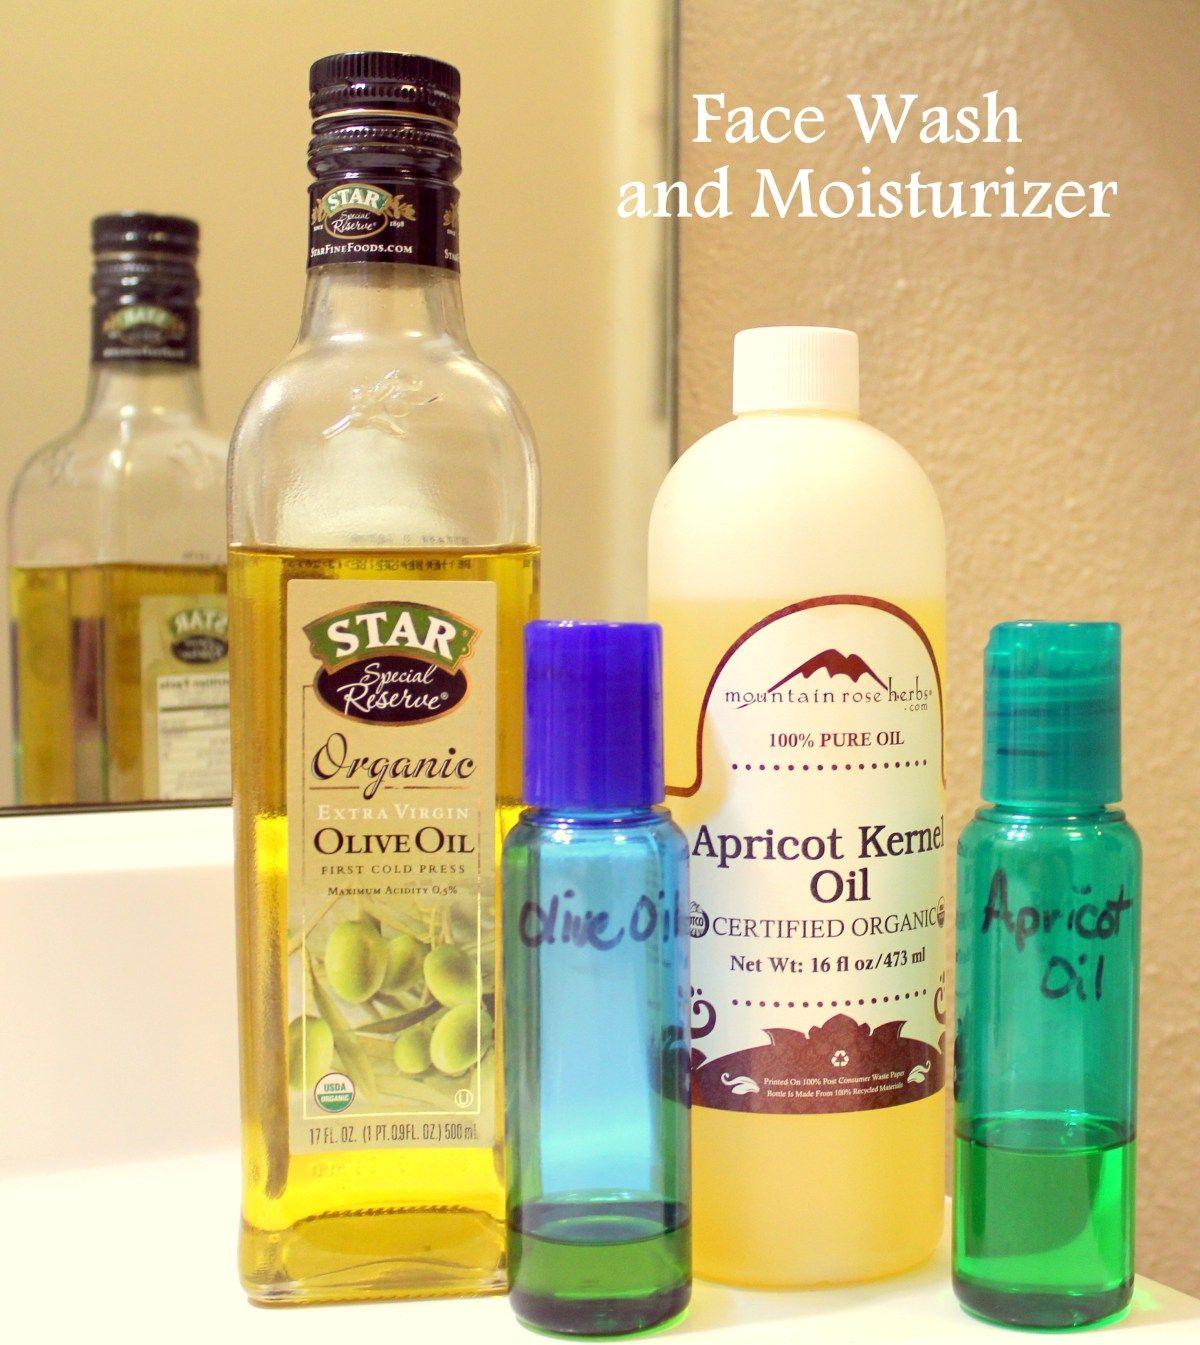 Oil Cleansing Method Recipe Oil cleansing method